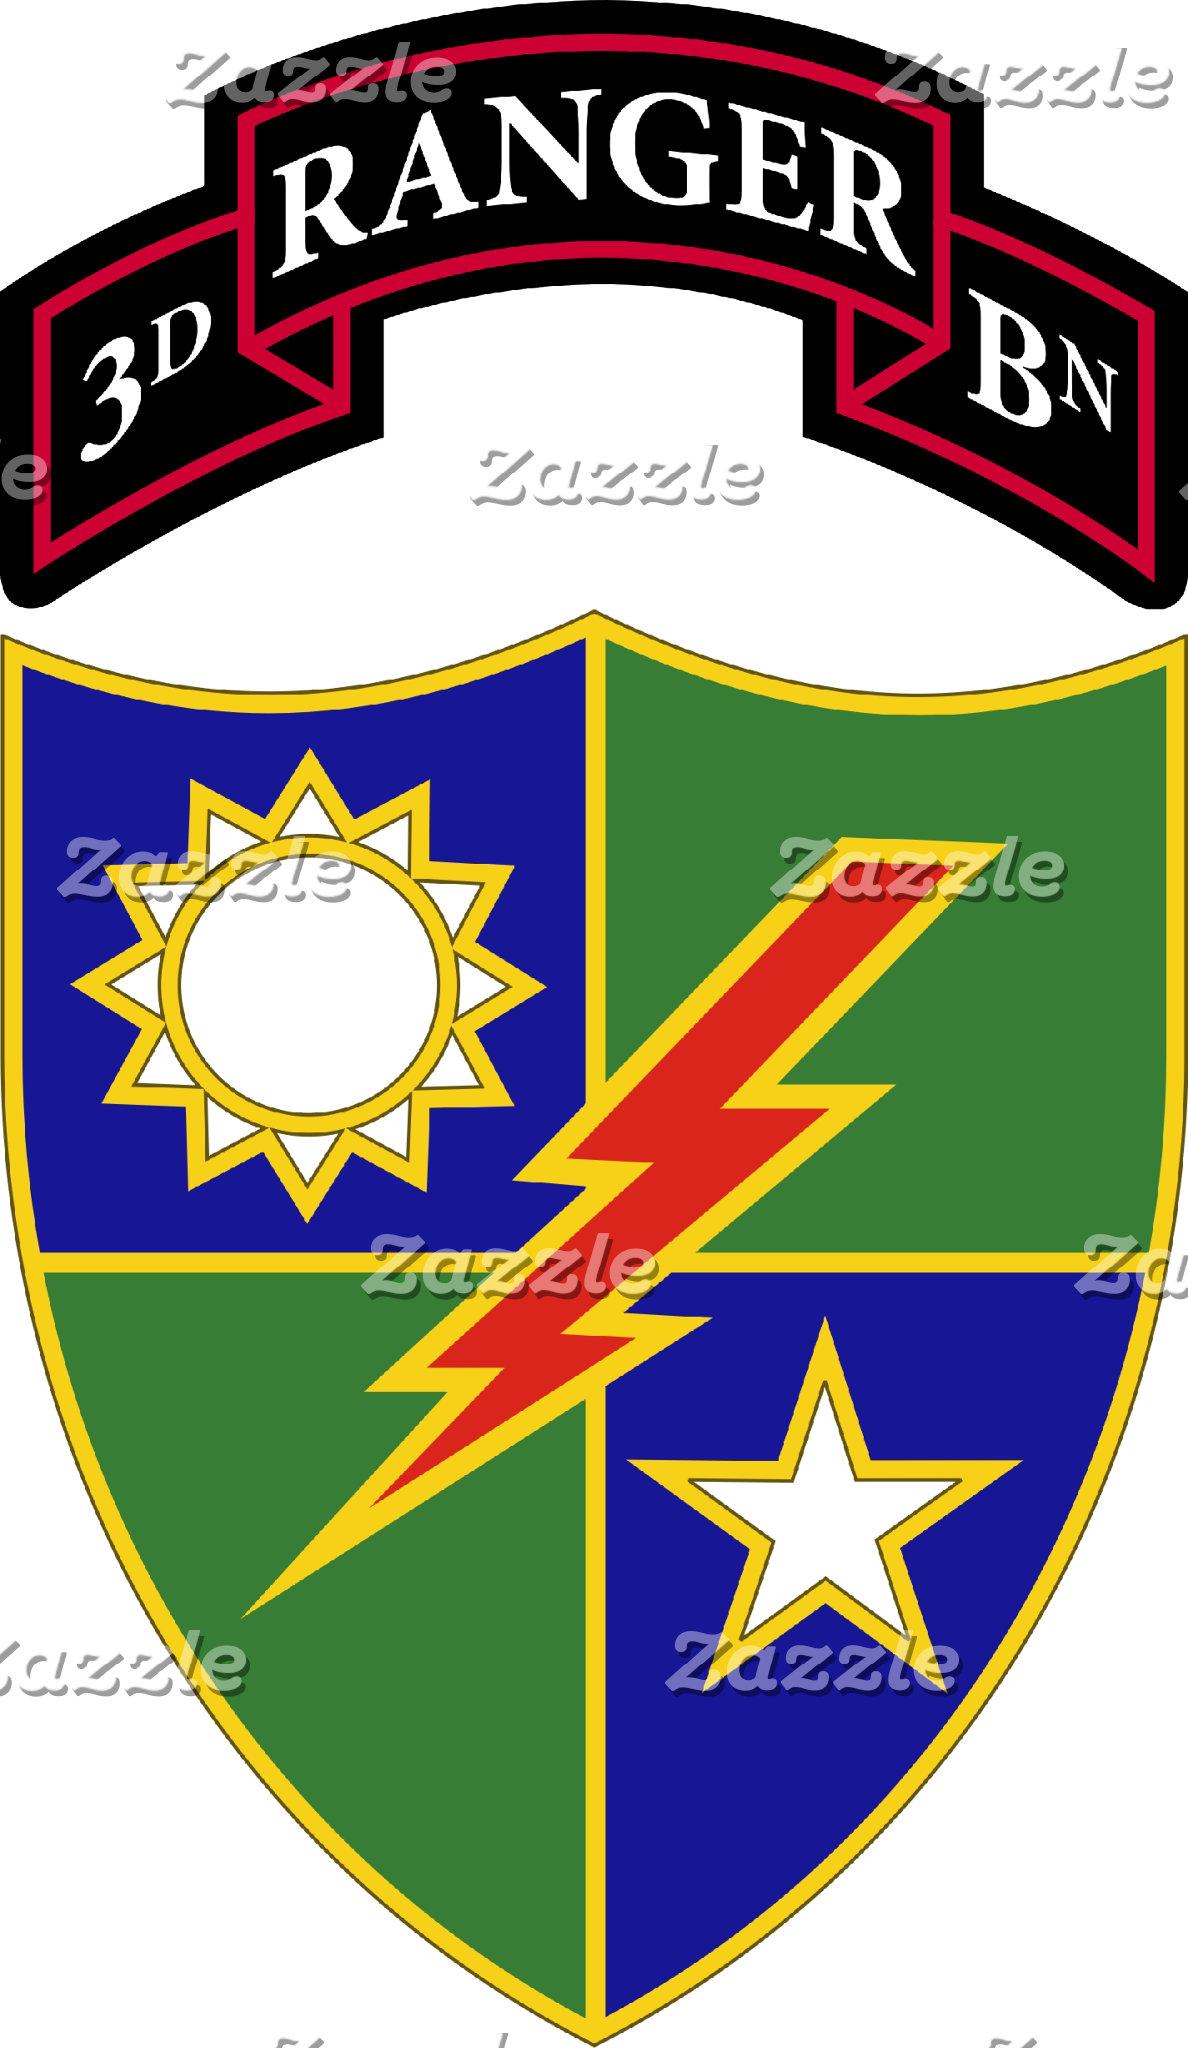 3rd Battalion - 75th Ranger Regiment